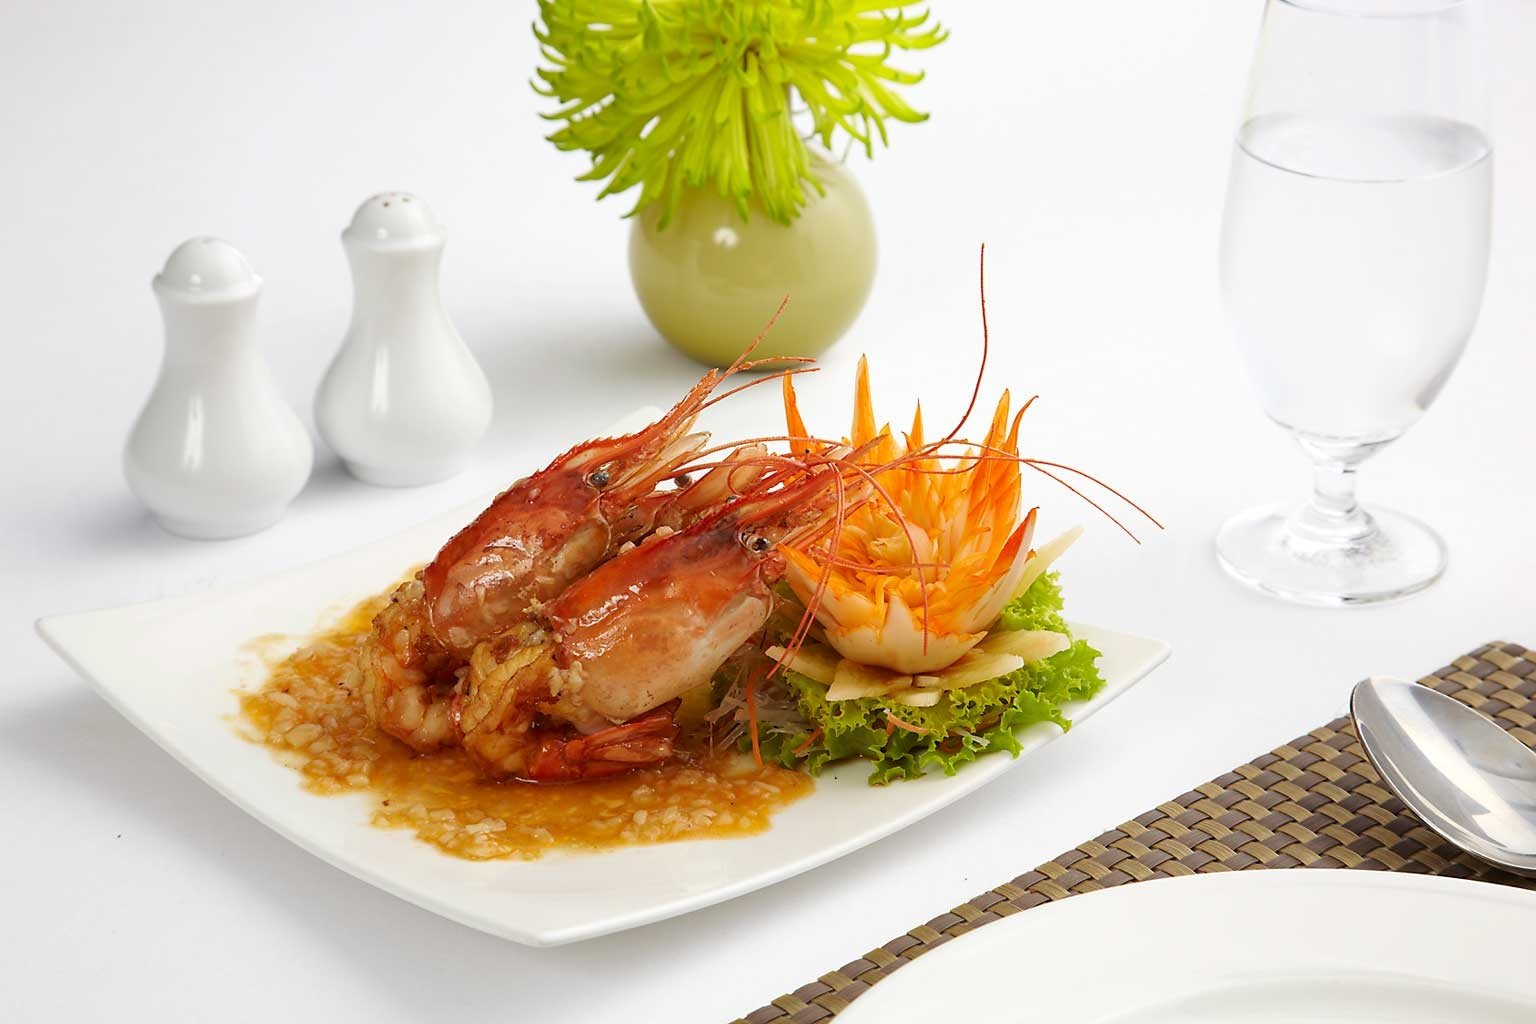 Dining Eat plate food cuisine fish restaurant Seafood breakfast arranged piece de resistance